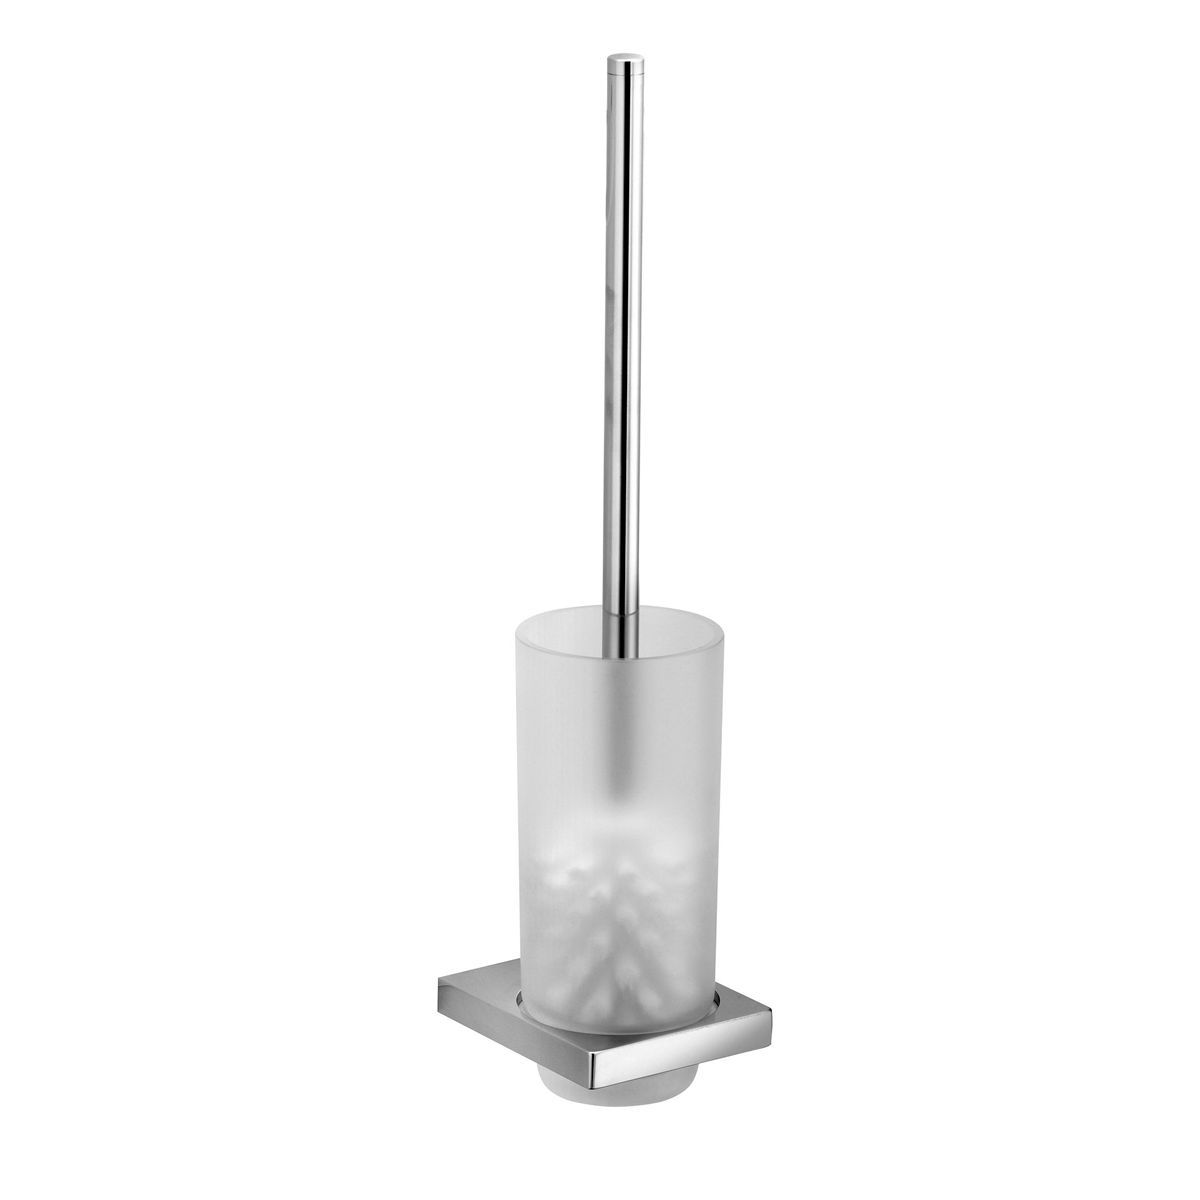 keuco edition 11 toilet brush set uk bathrooms. Black Bedroom Furniture Sets. Home Design Ideas